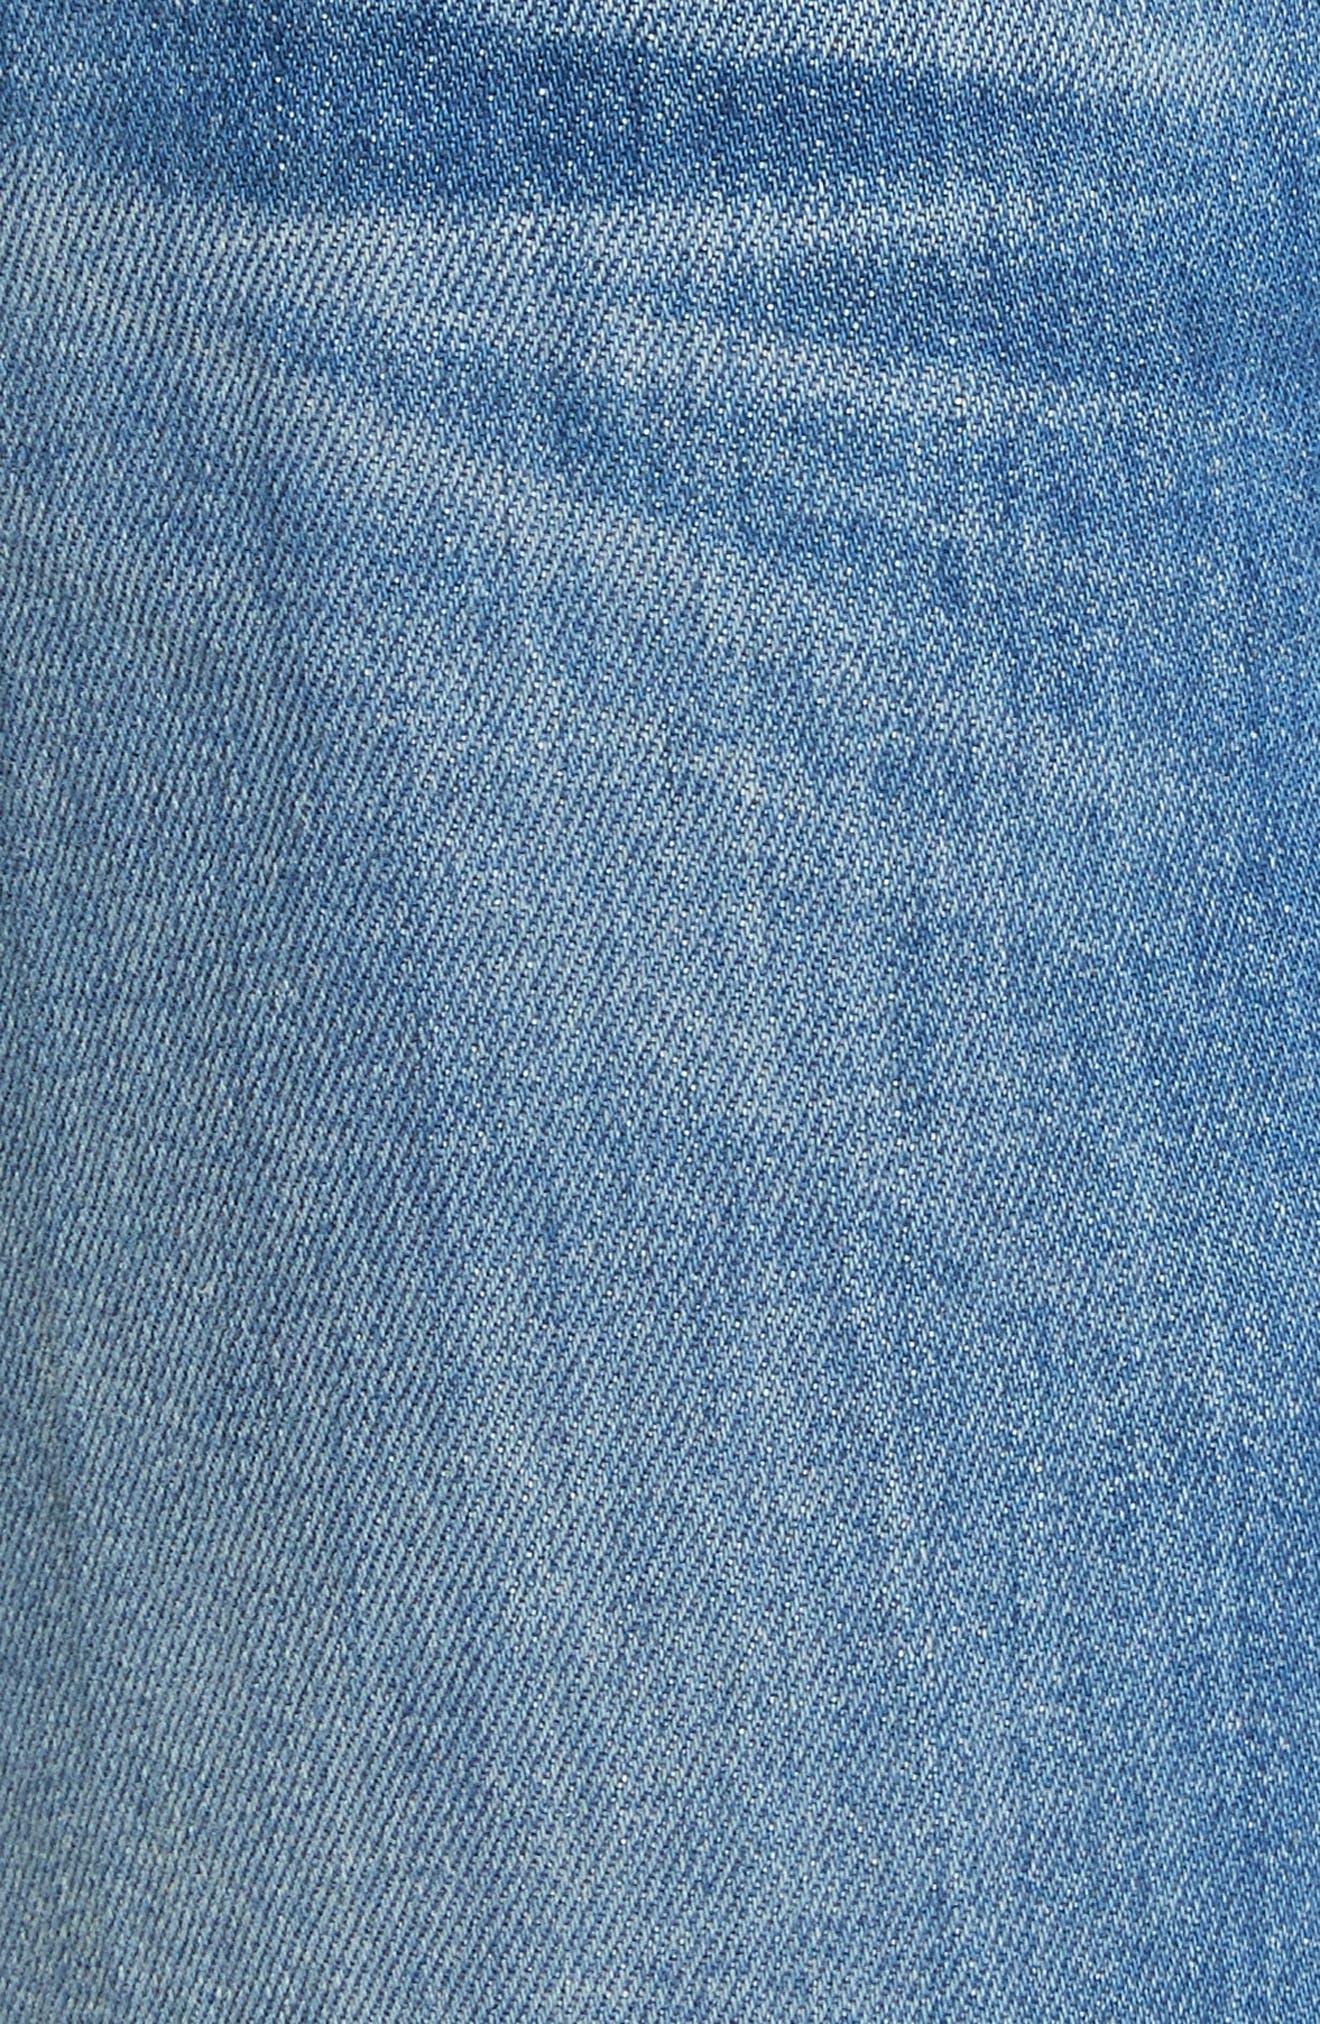 AO.LA Good High Waist Ankle Skinny Jeans,                             Alternate thumbnail 5, color,